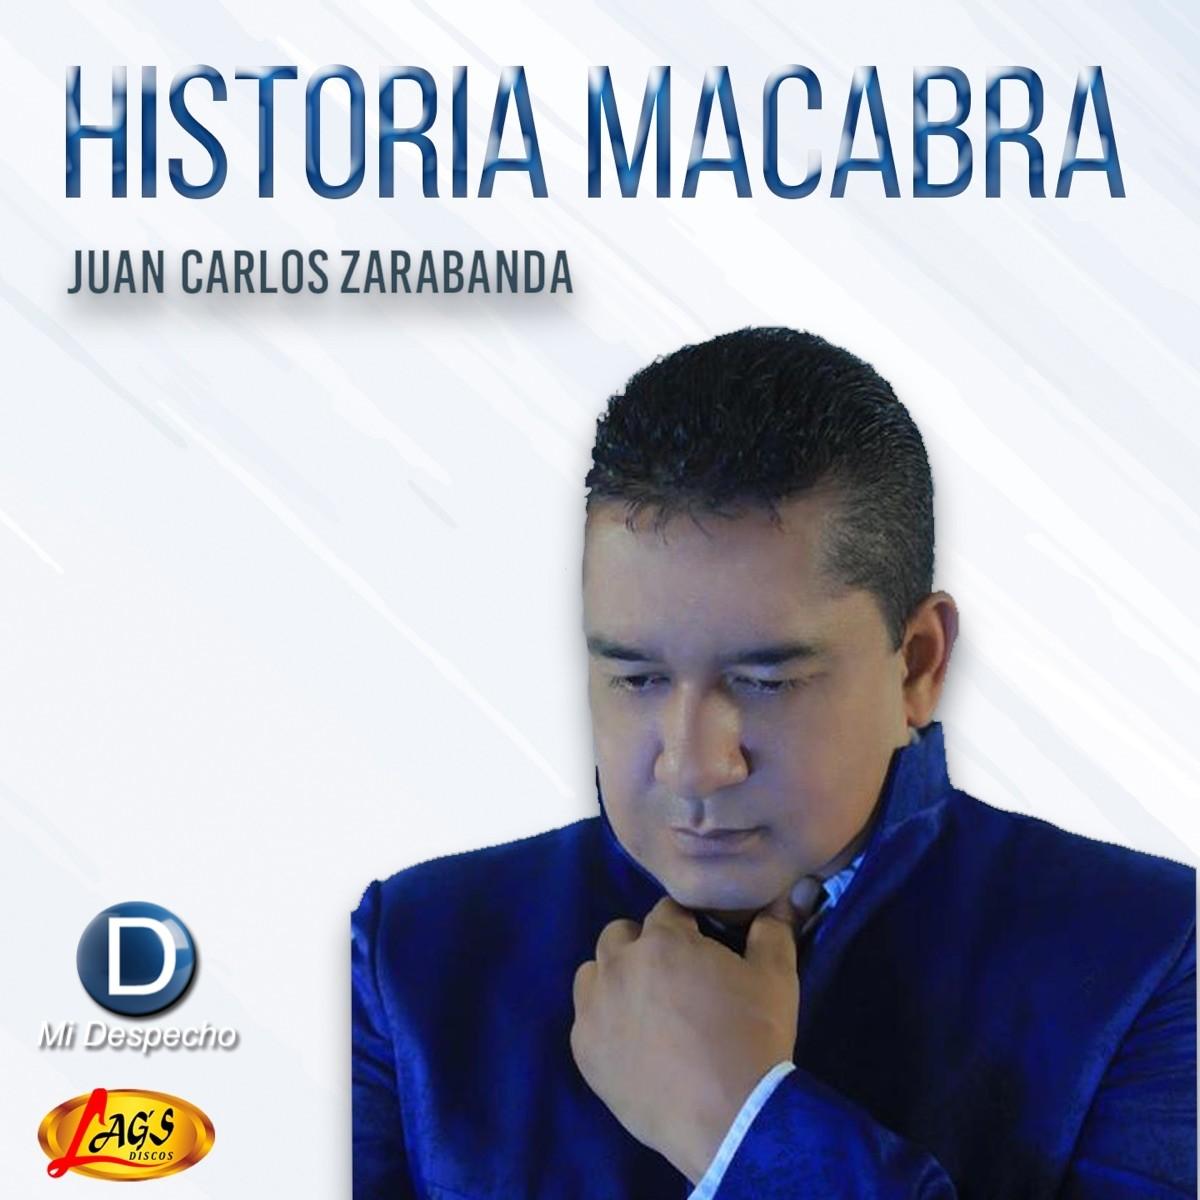 Juan Carlos Zarabanda Historia Macabra Frontal